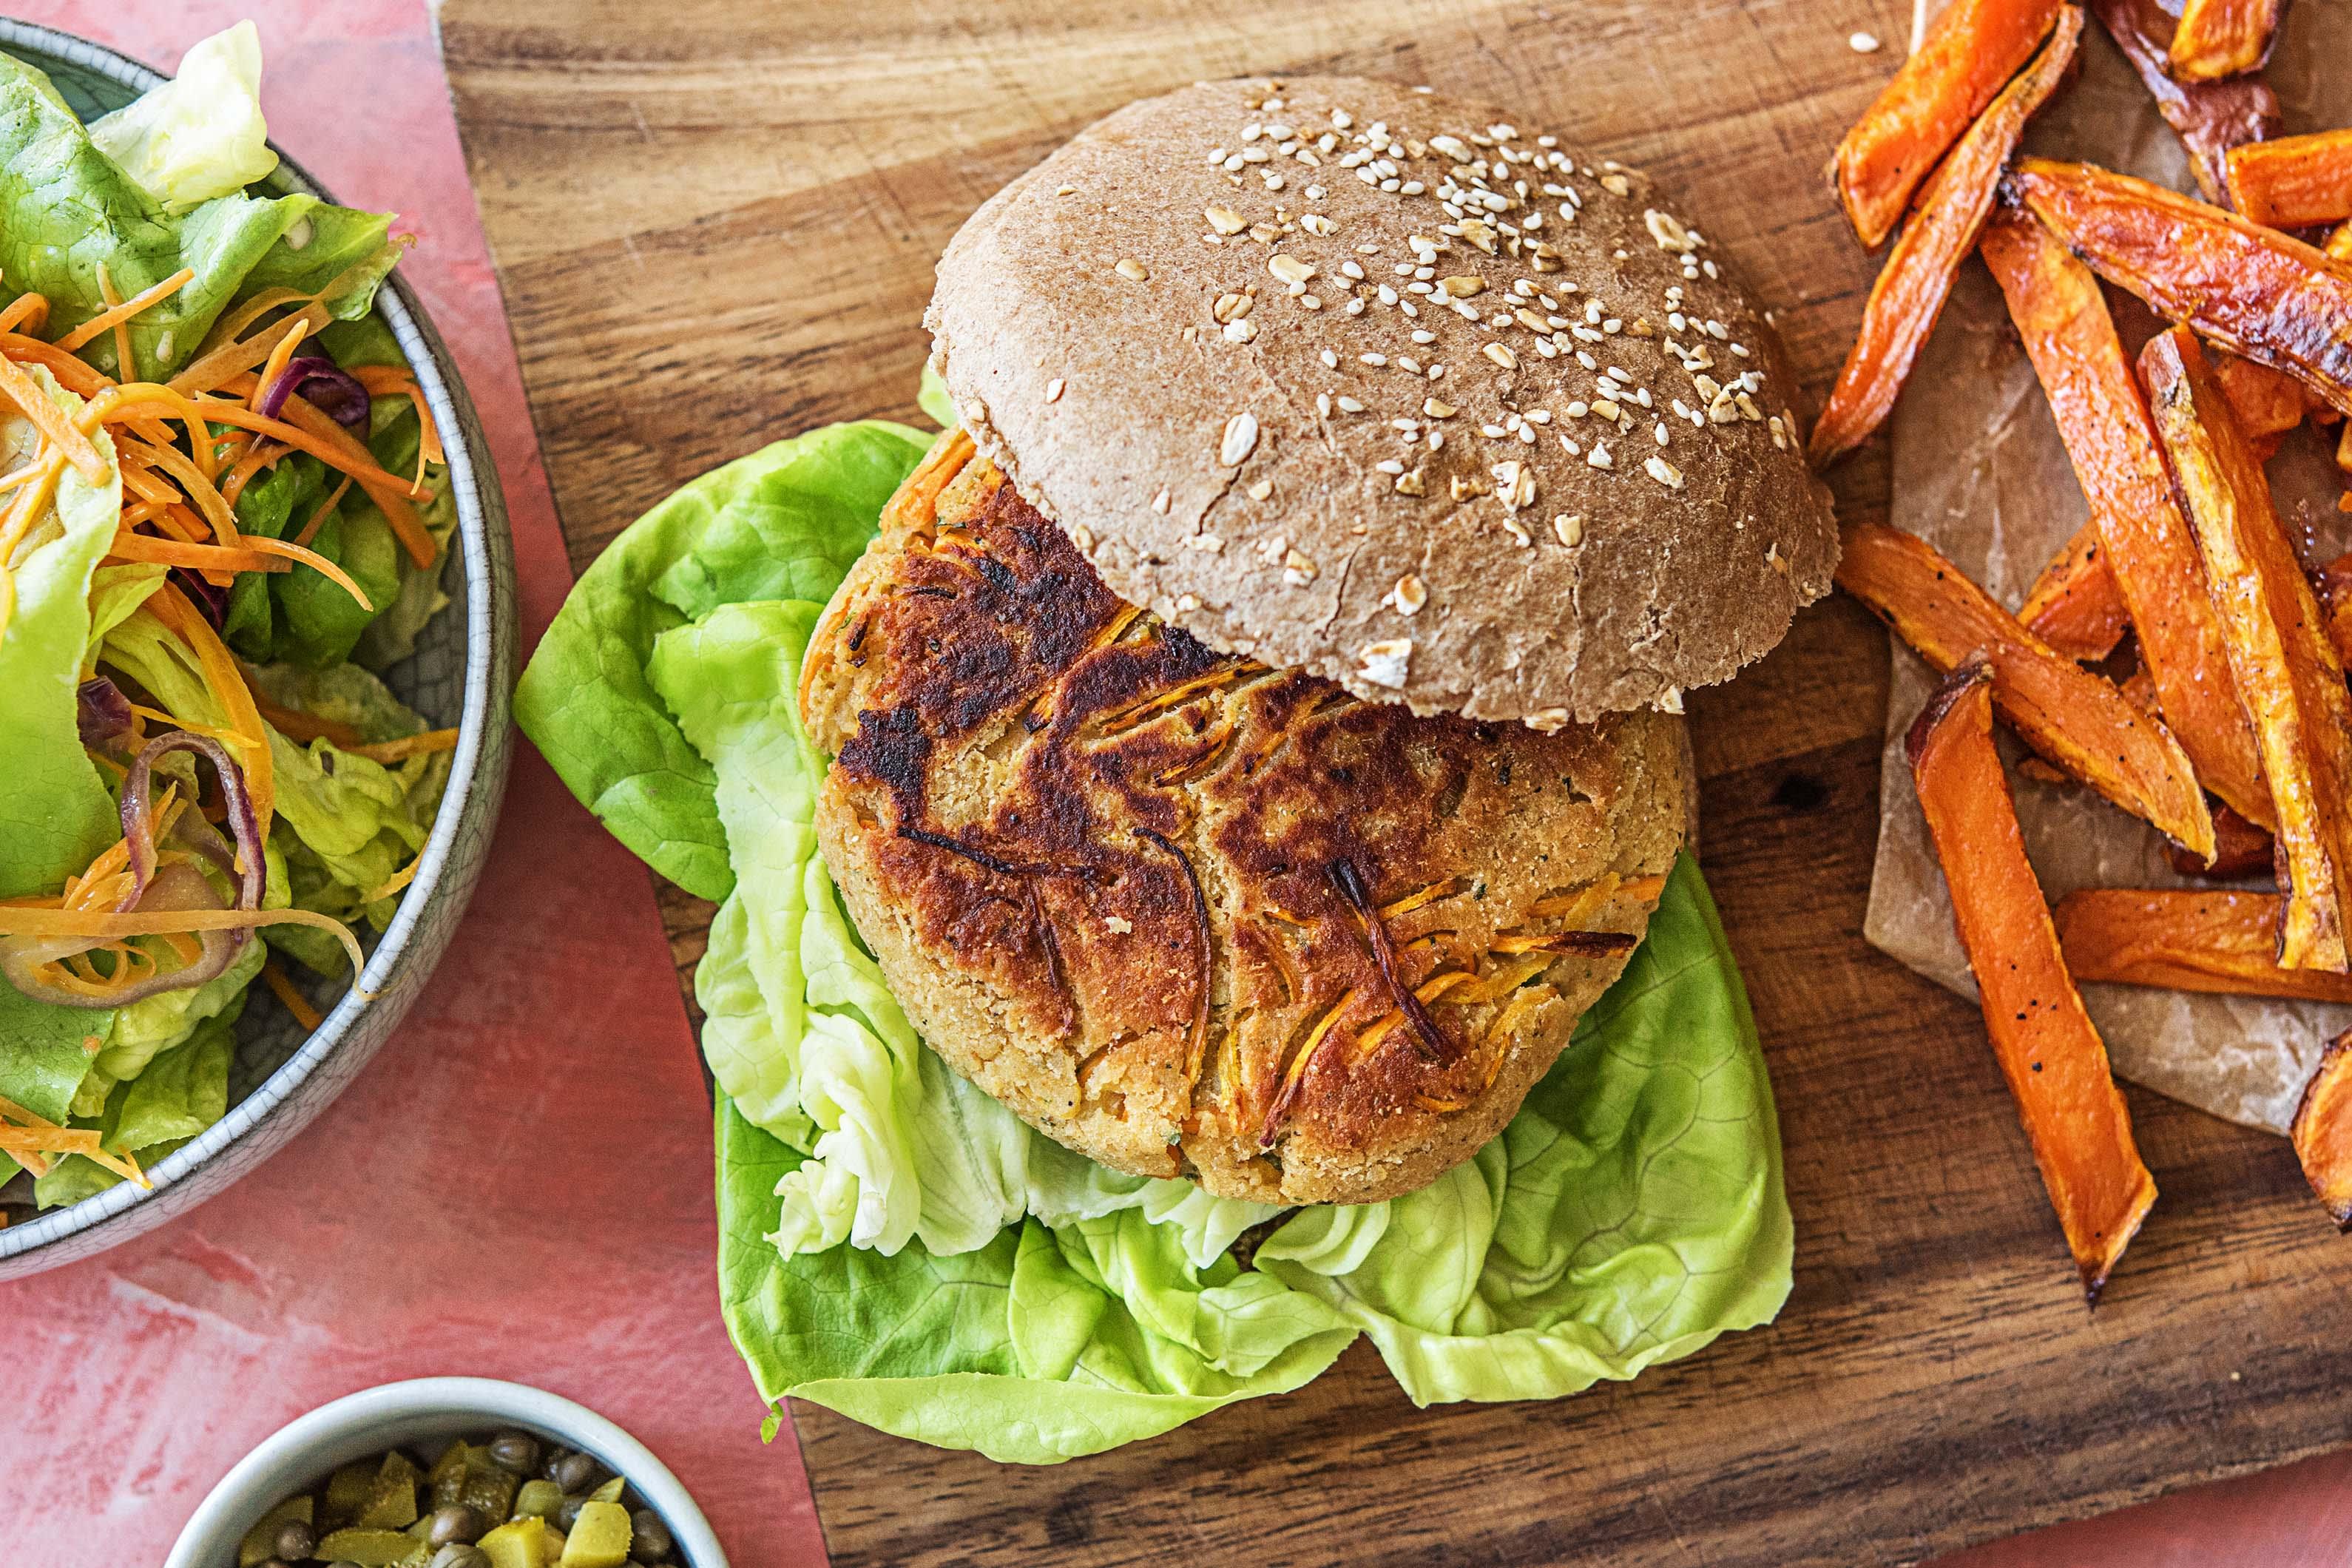 Groenteburger met wortel en ravigotesaus